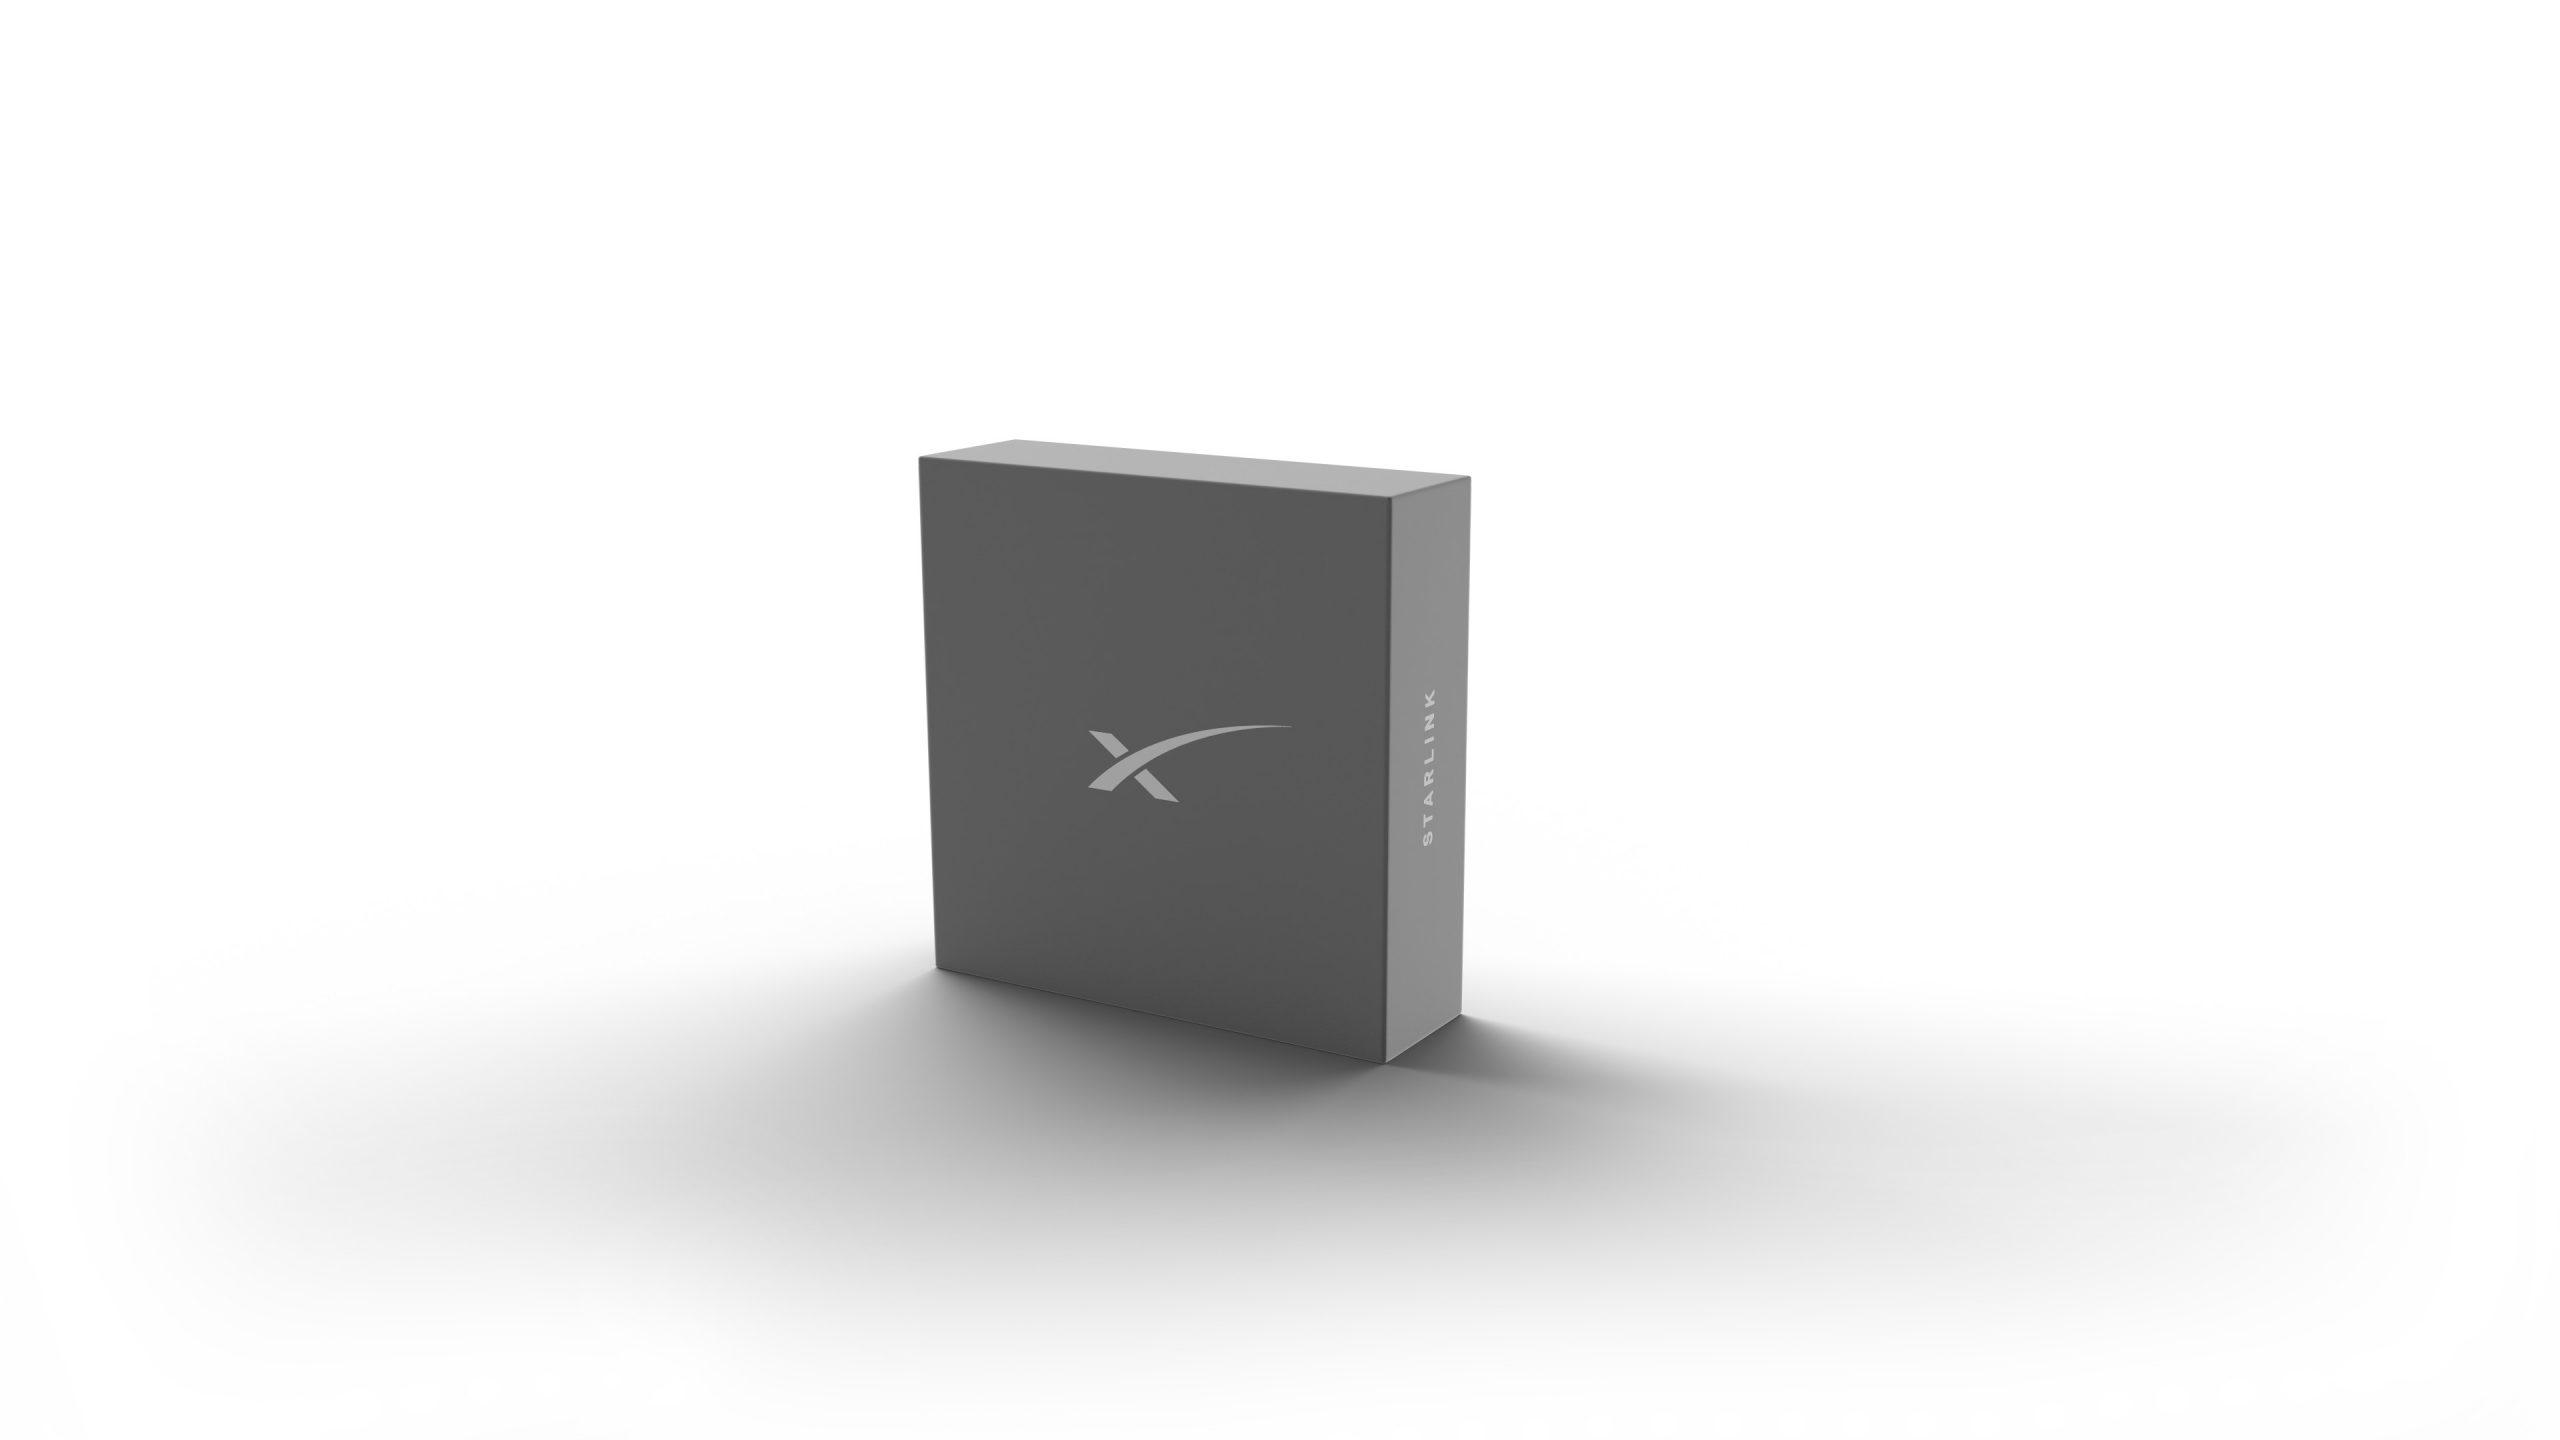 Starlink box